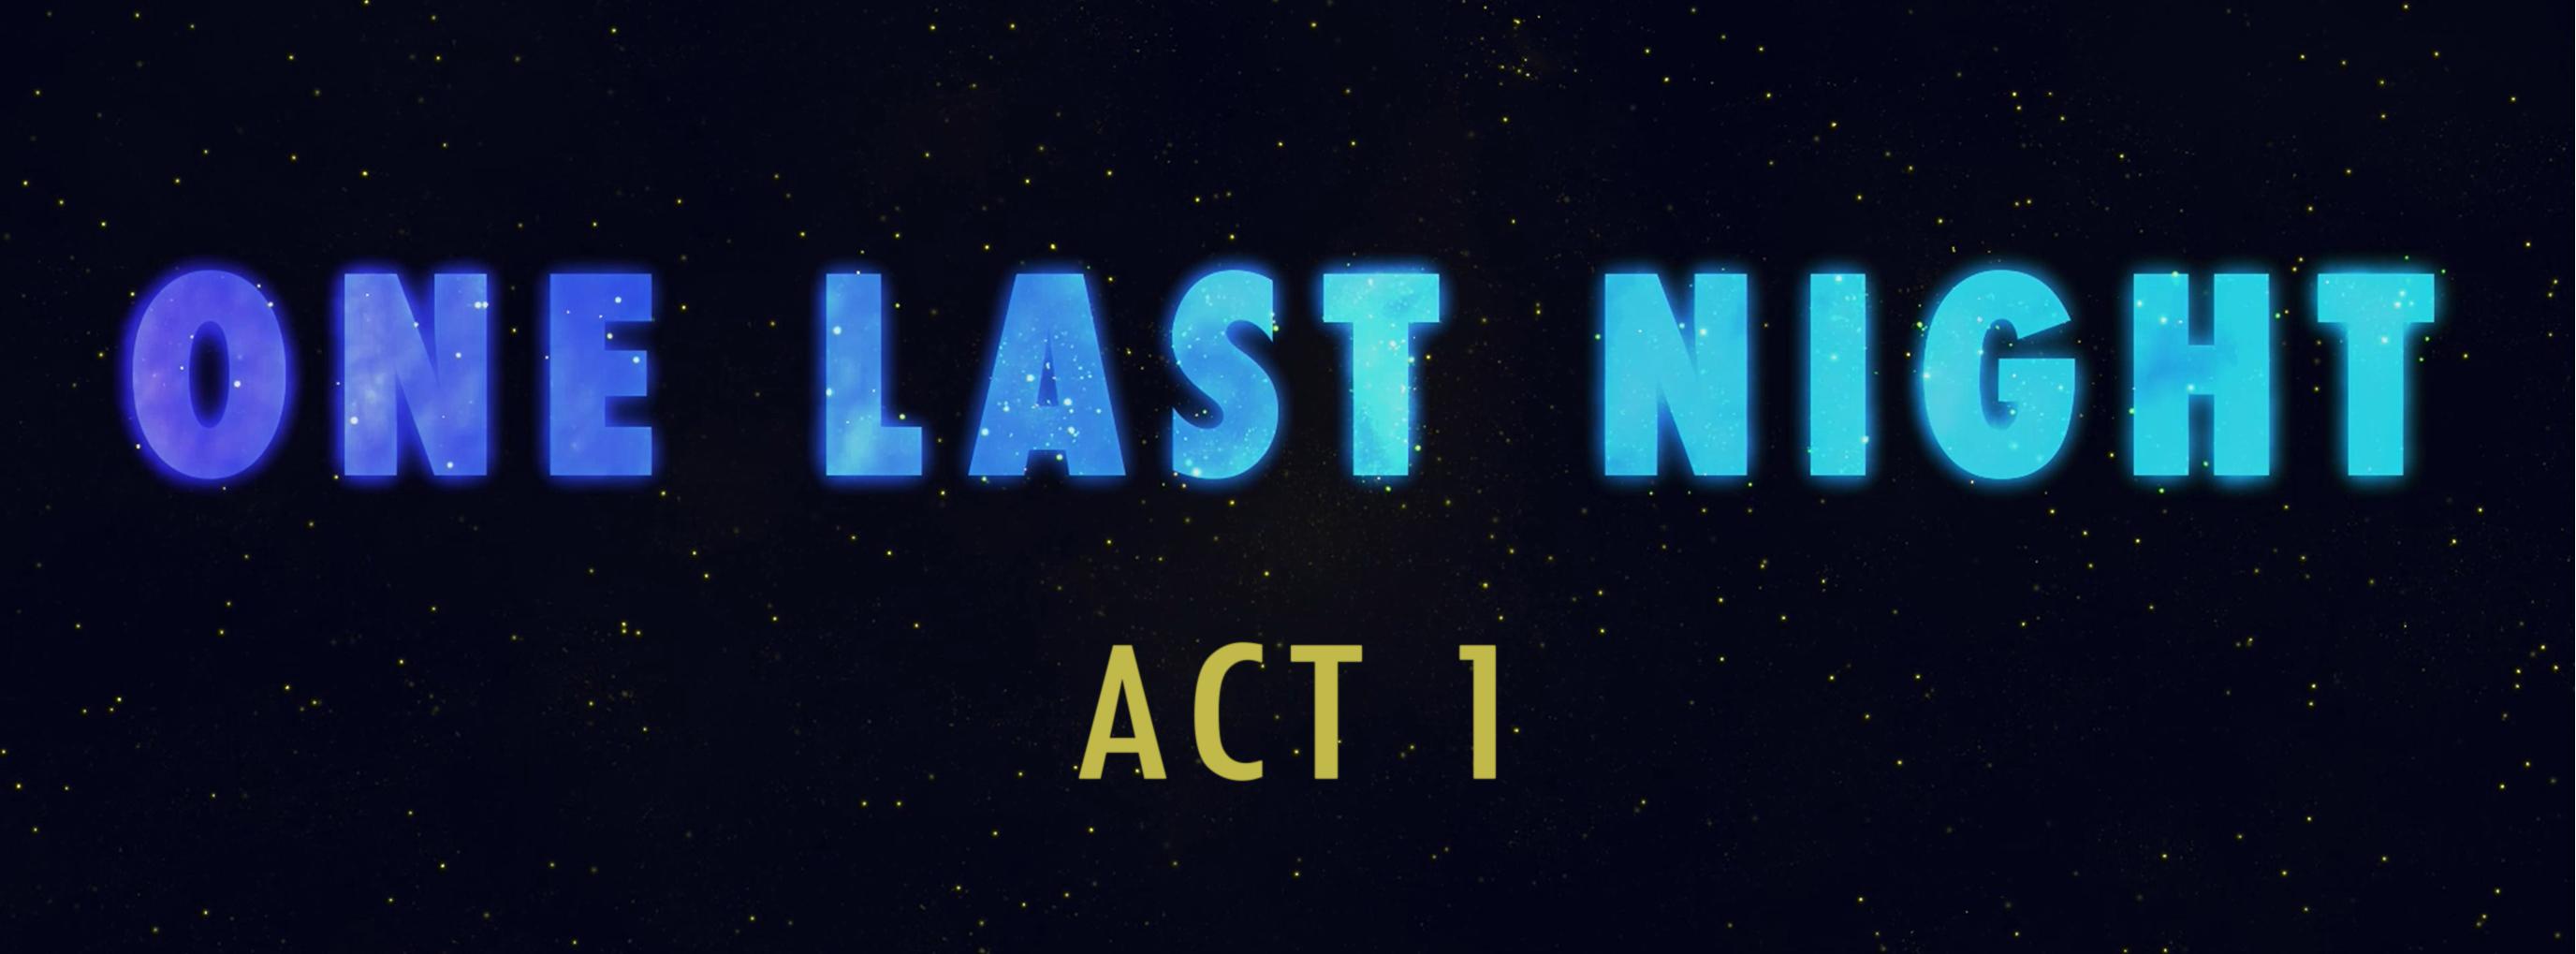 One Last Night - Act 1